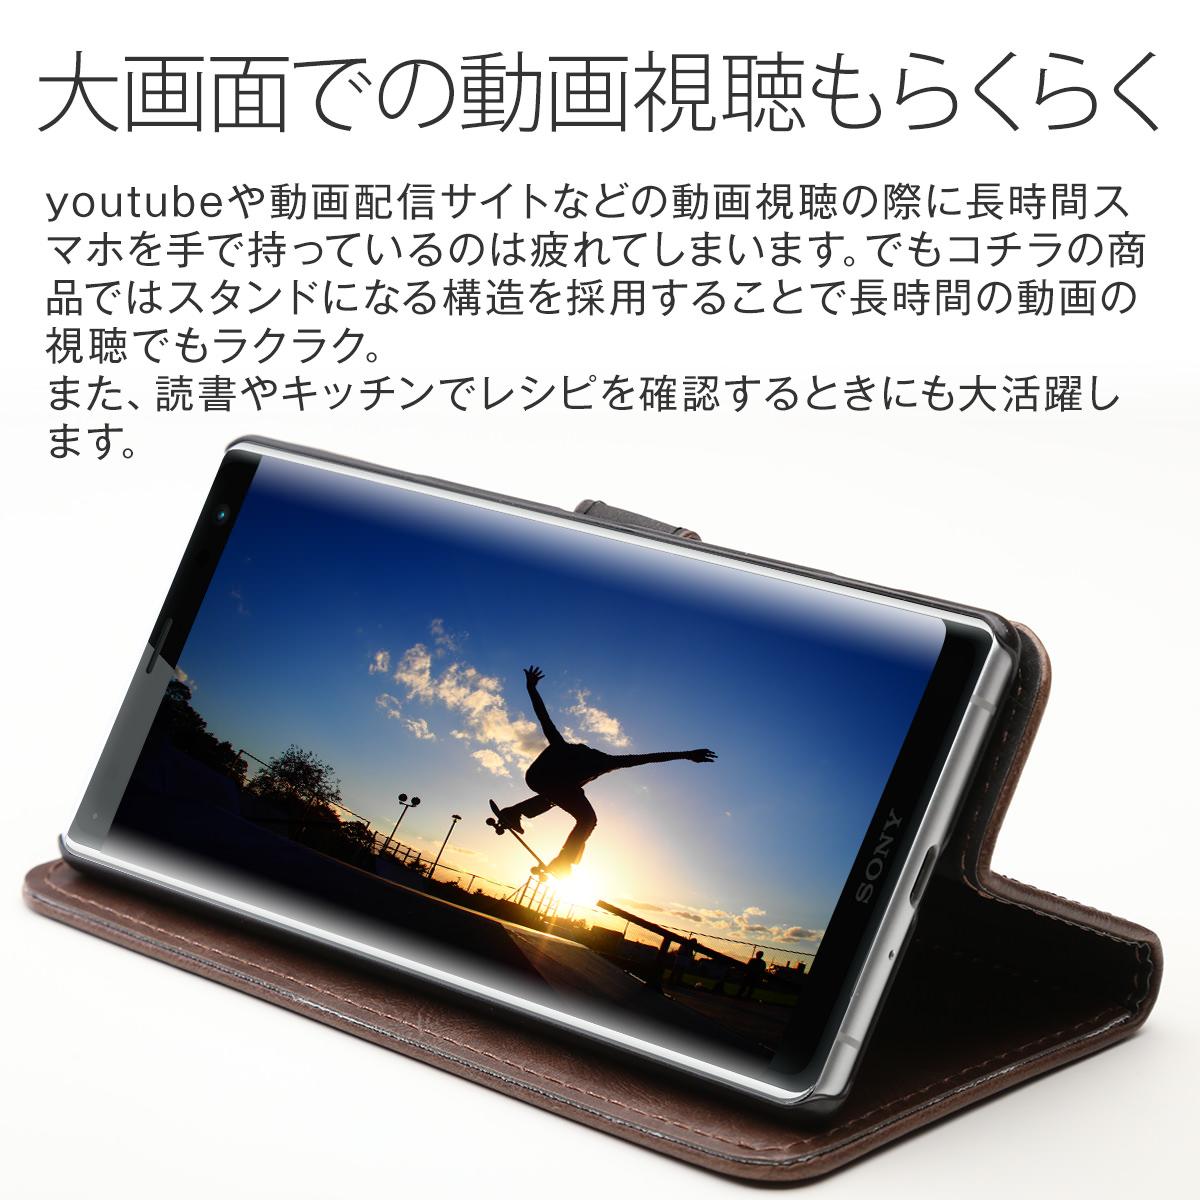 Xperia XZ3 SO-01L SOV39 801SO アンティーク ビンテージ レザー 手帳型ケース xperia エクスペリア xz3 so-01l soc39 801so